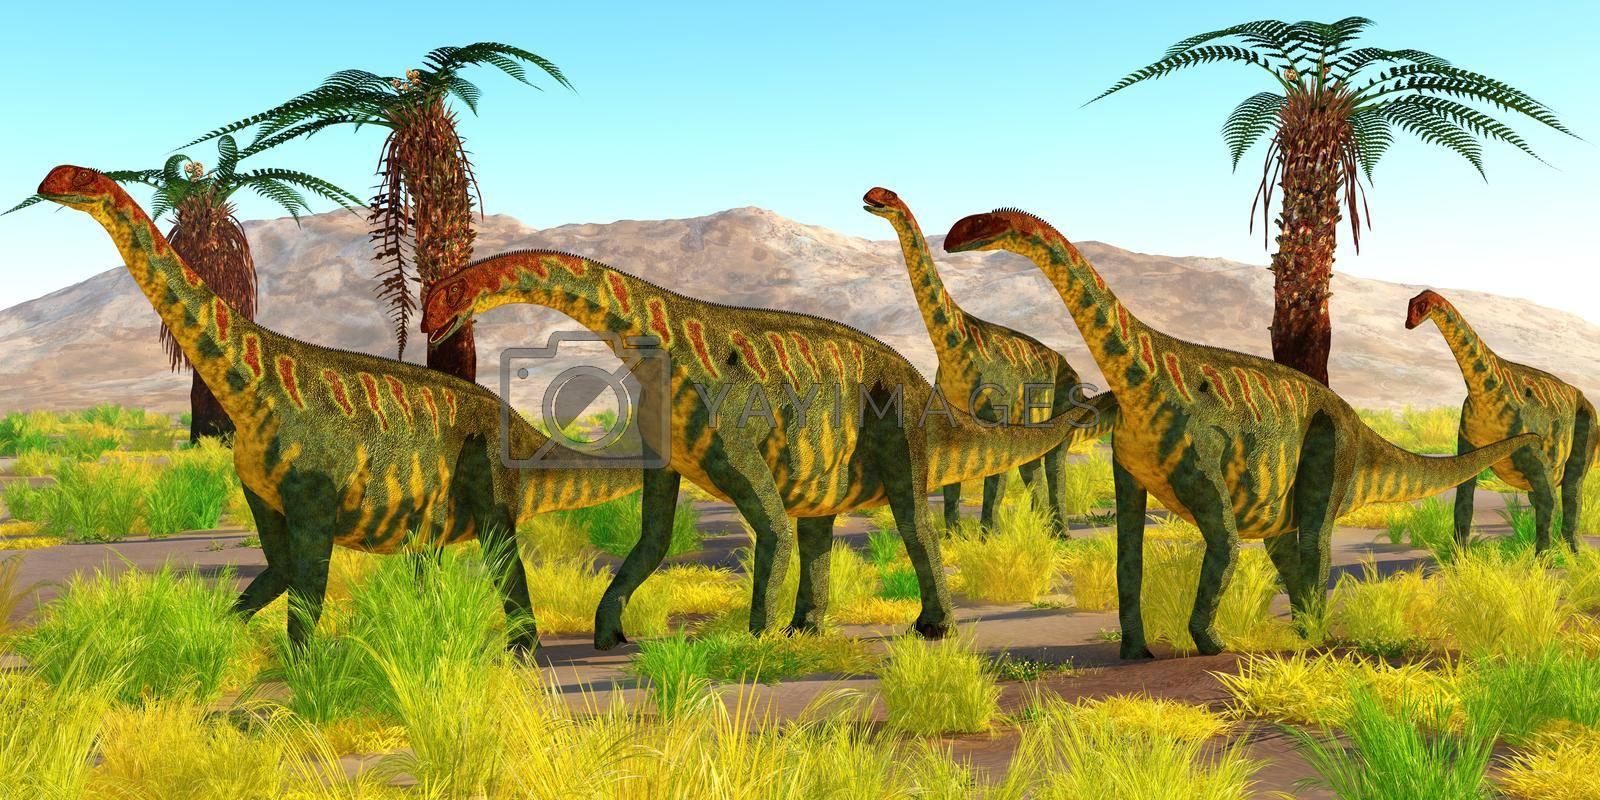 Jobaria Dinosaurs by Catmando